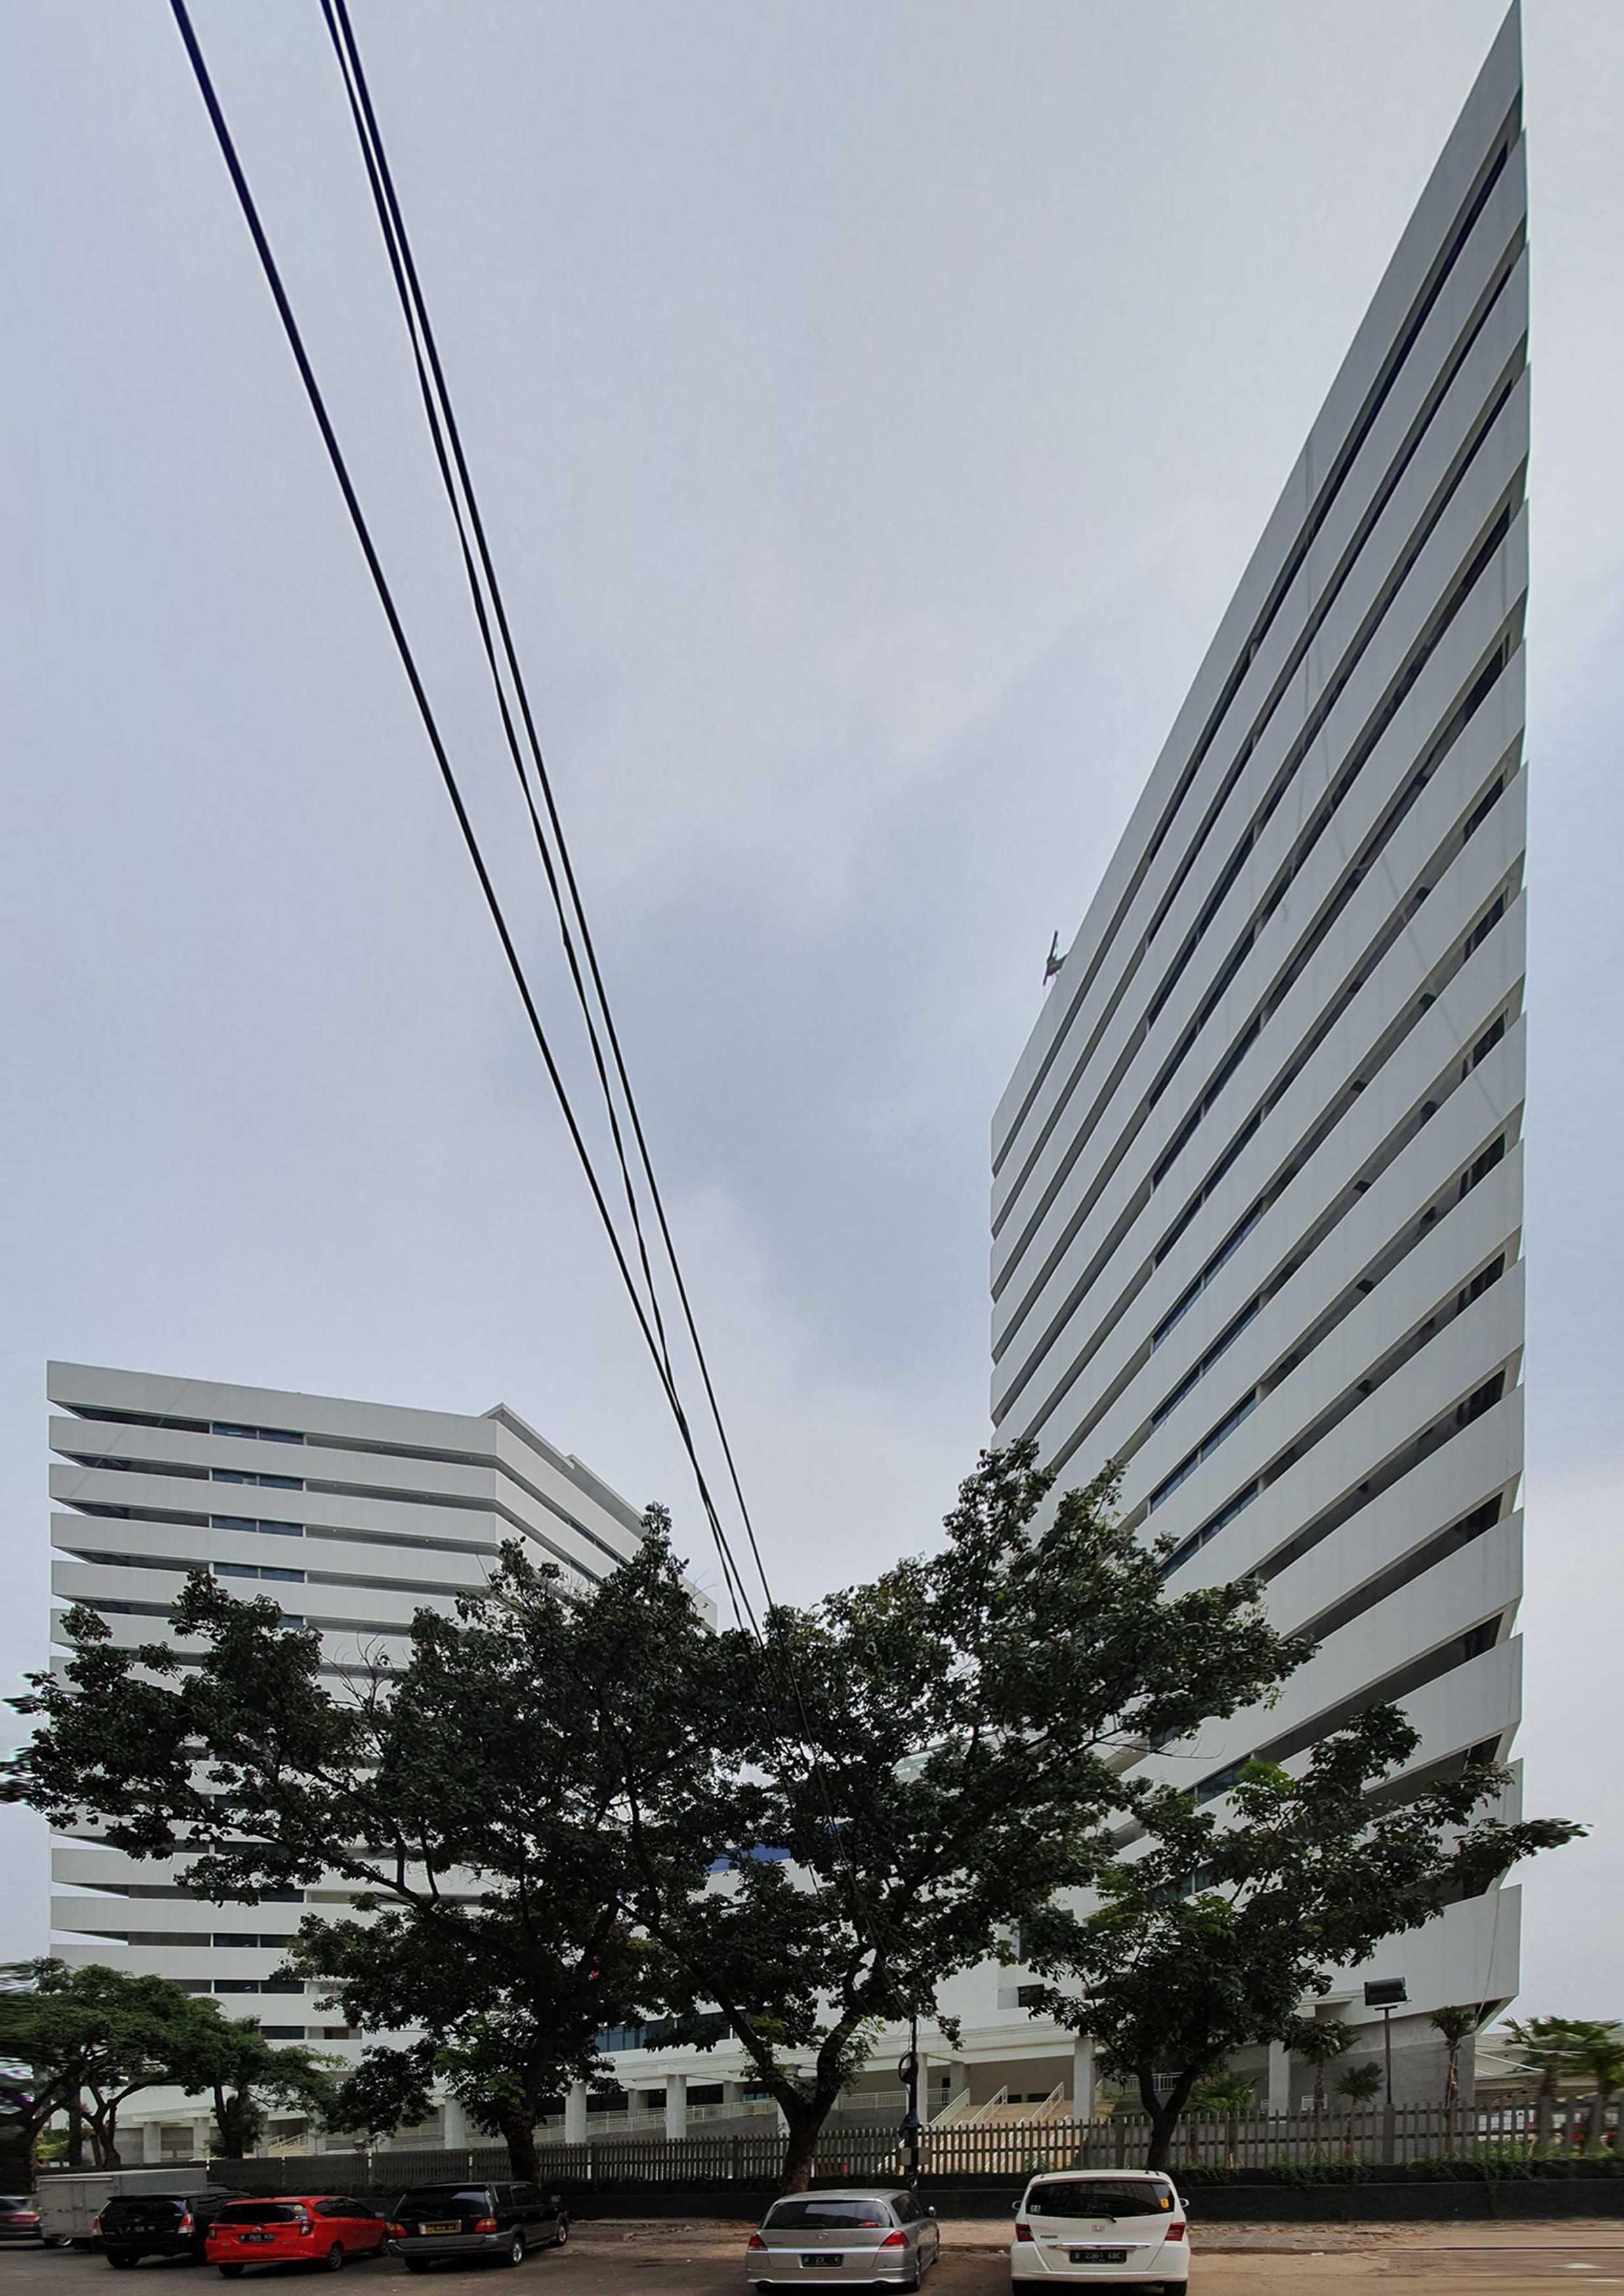 P   R   A   M   U   D   Y   A Asean Secretariat Building Jalan Sisingamangaraja, 70A, Rt.2/rw.1, Selong, Kec. Kby. Baru, Kota Jakarta Selatan, Daerah Khusus Ibukota Jakarta 12110, Indonesia Jalan Sisingamangaraja, 70A, Rt.2/rw.1, Selong, Kec. Kby. Baru, Kota Jakarta Selatan, Daerah Khusus Ibukota Jakarta 12110, Indonesia Pramudya-Asean-Secretariat-Building   89273